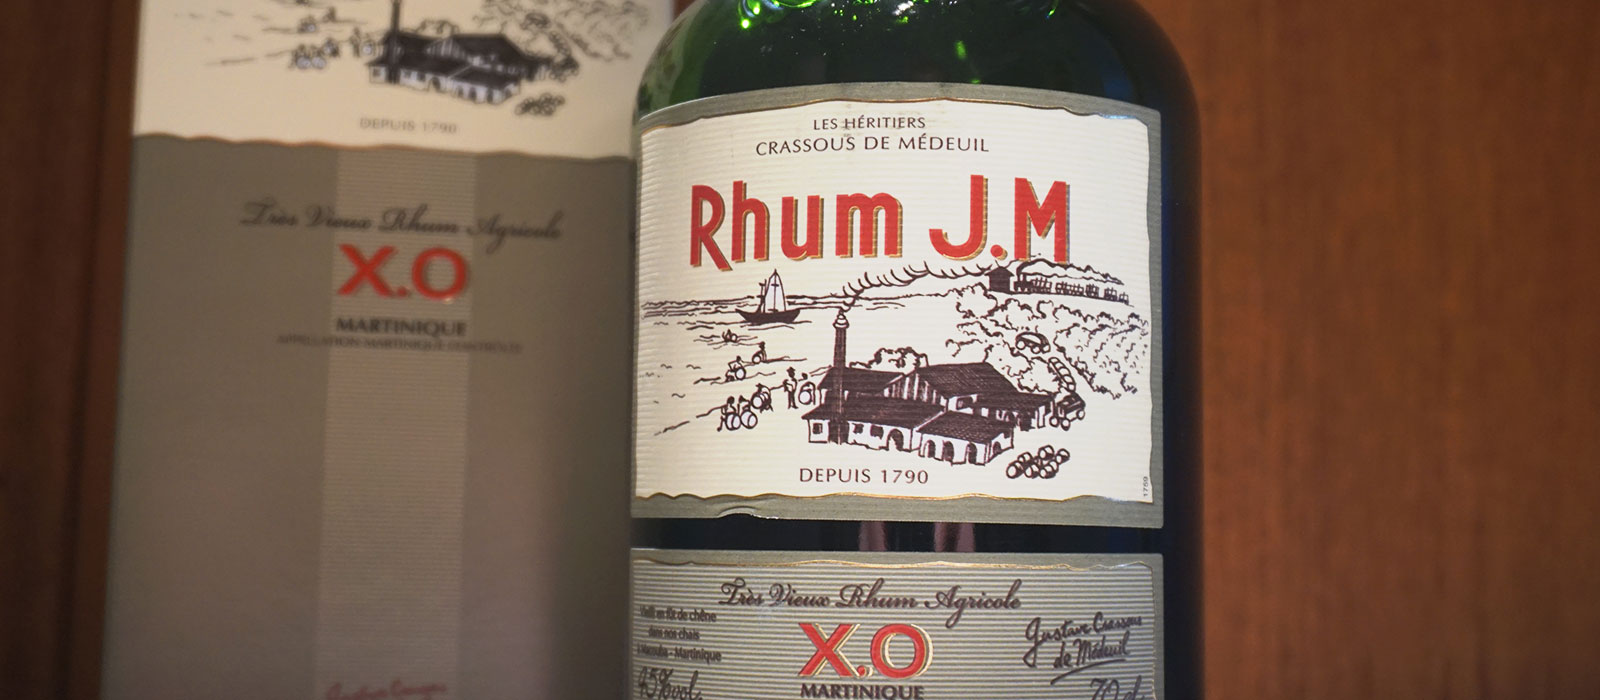 Månadens rom juni 2017: Rhum J.M. XO